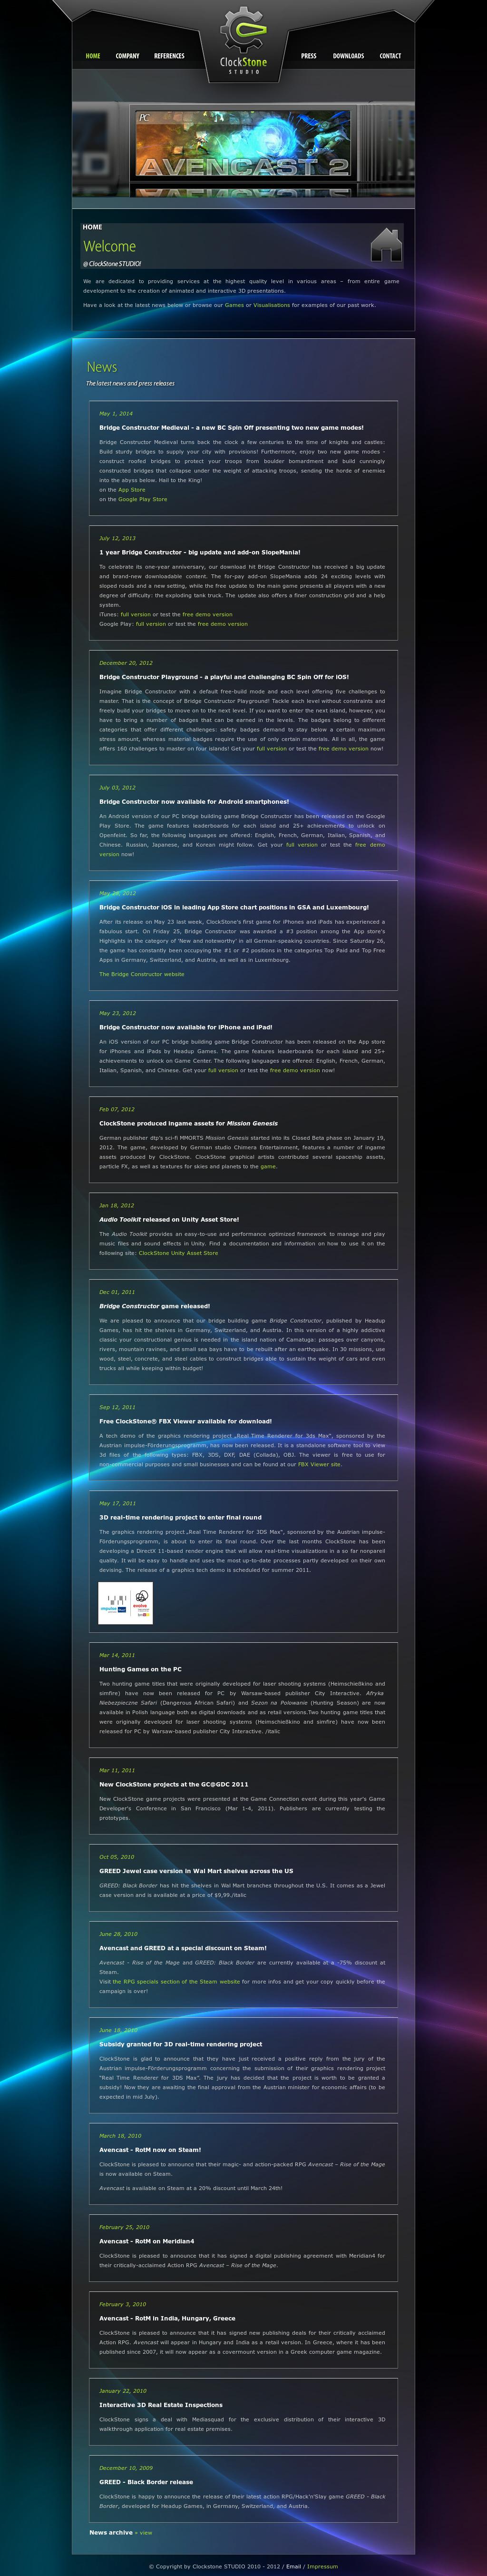 Clockstone STUDIO Competitors, Revenue and Employees - Owler Company